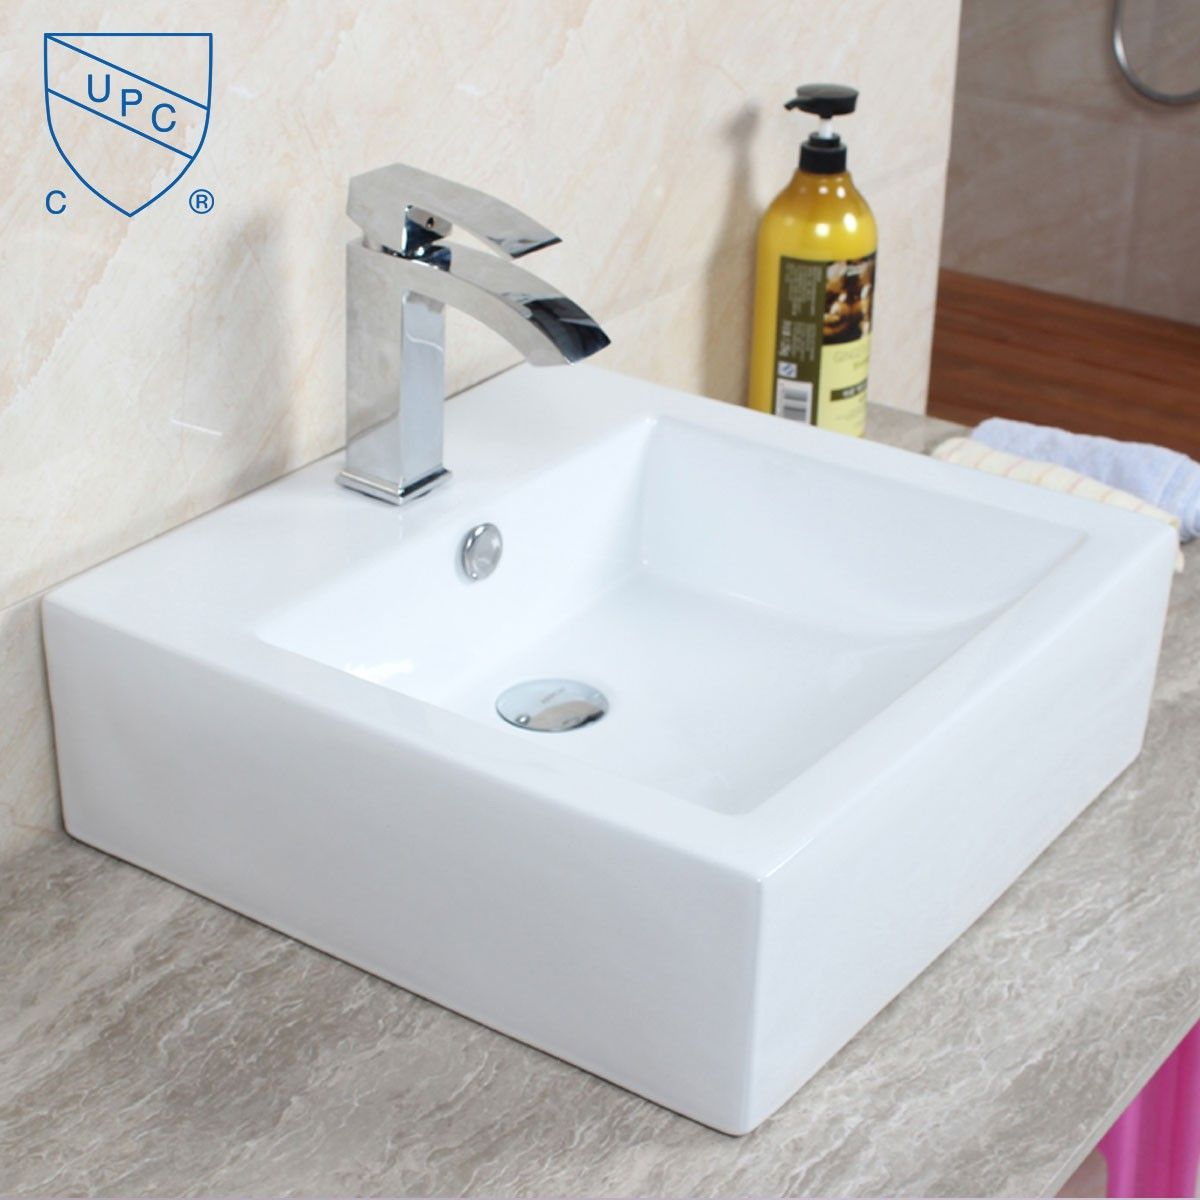 Lavabo vasque carr de dessus de comptoir en c ramique for Dessus de comptoir salle de bain